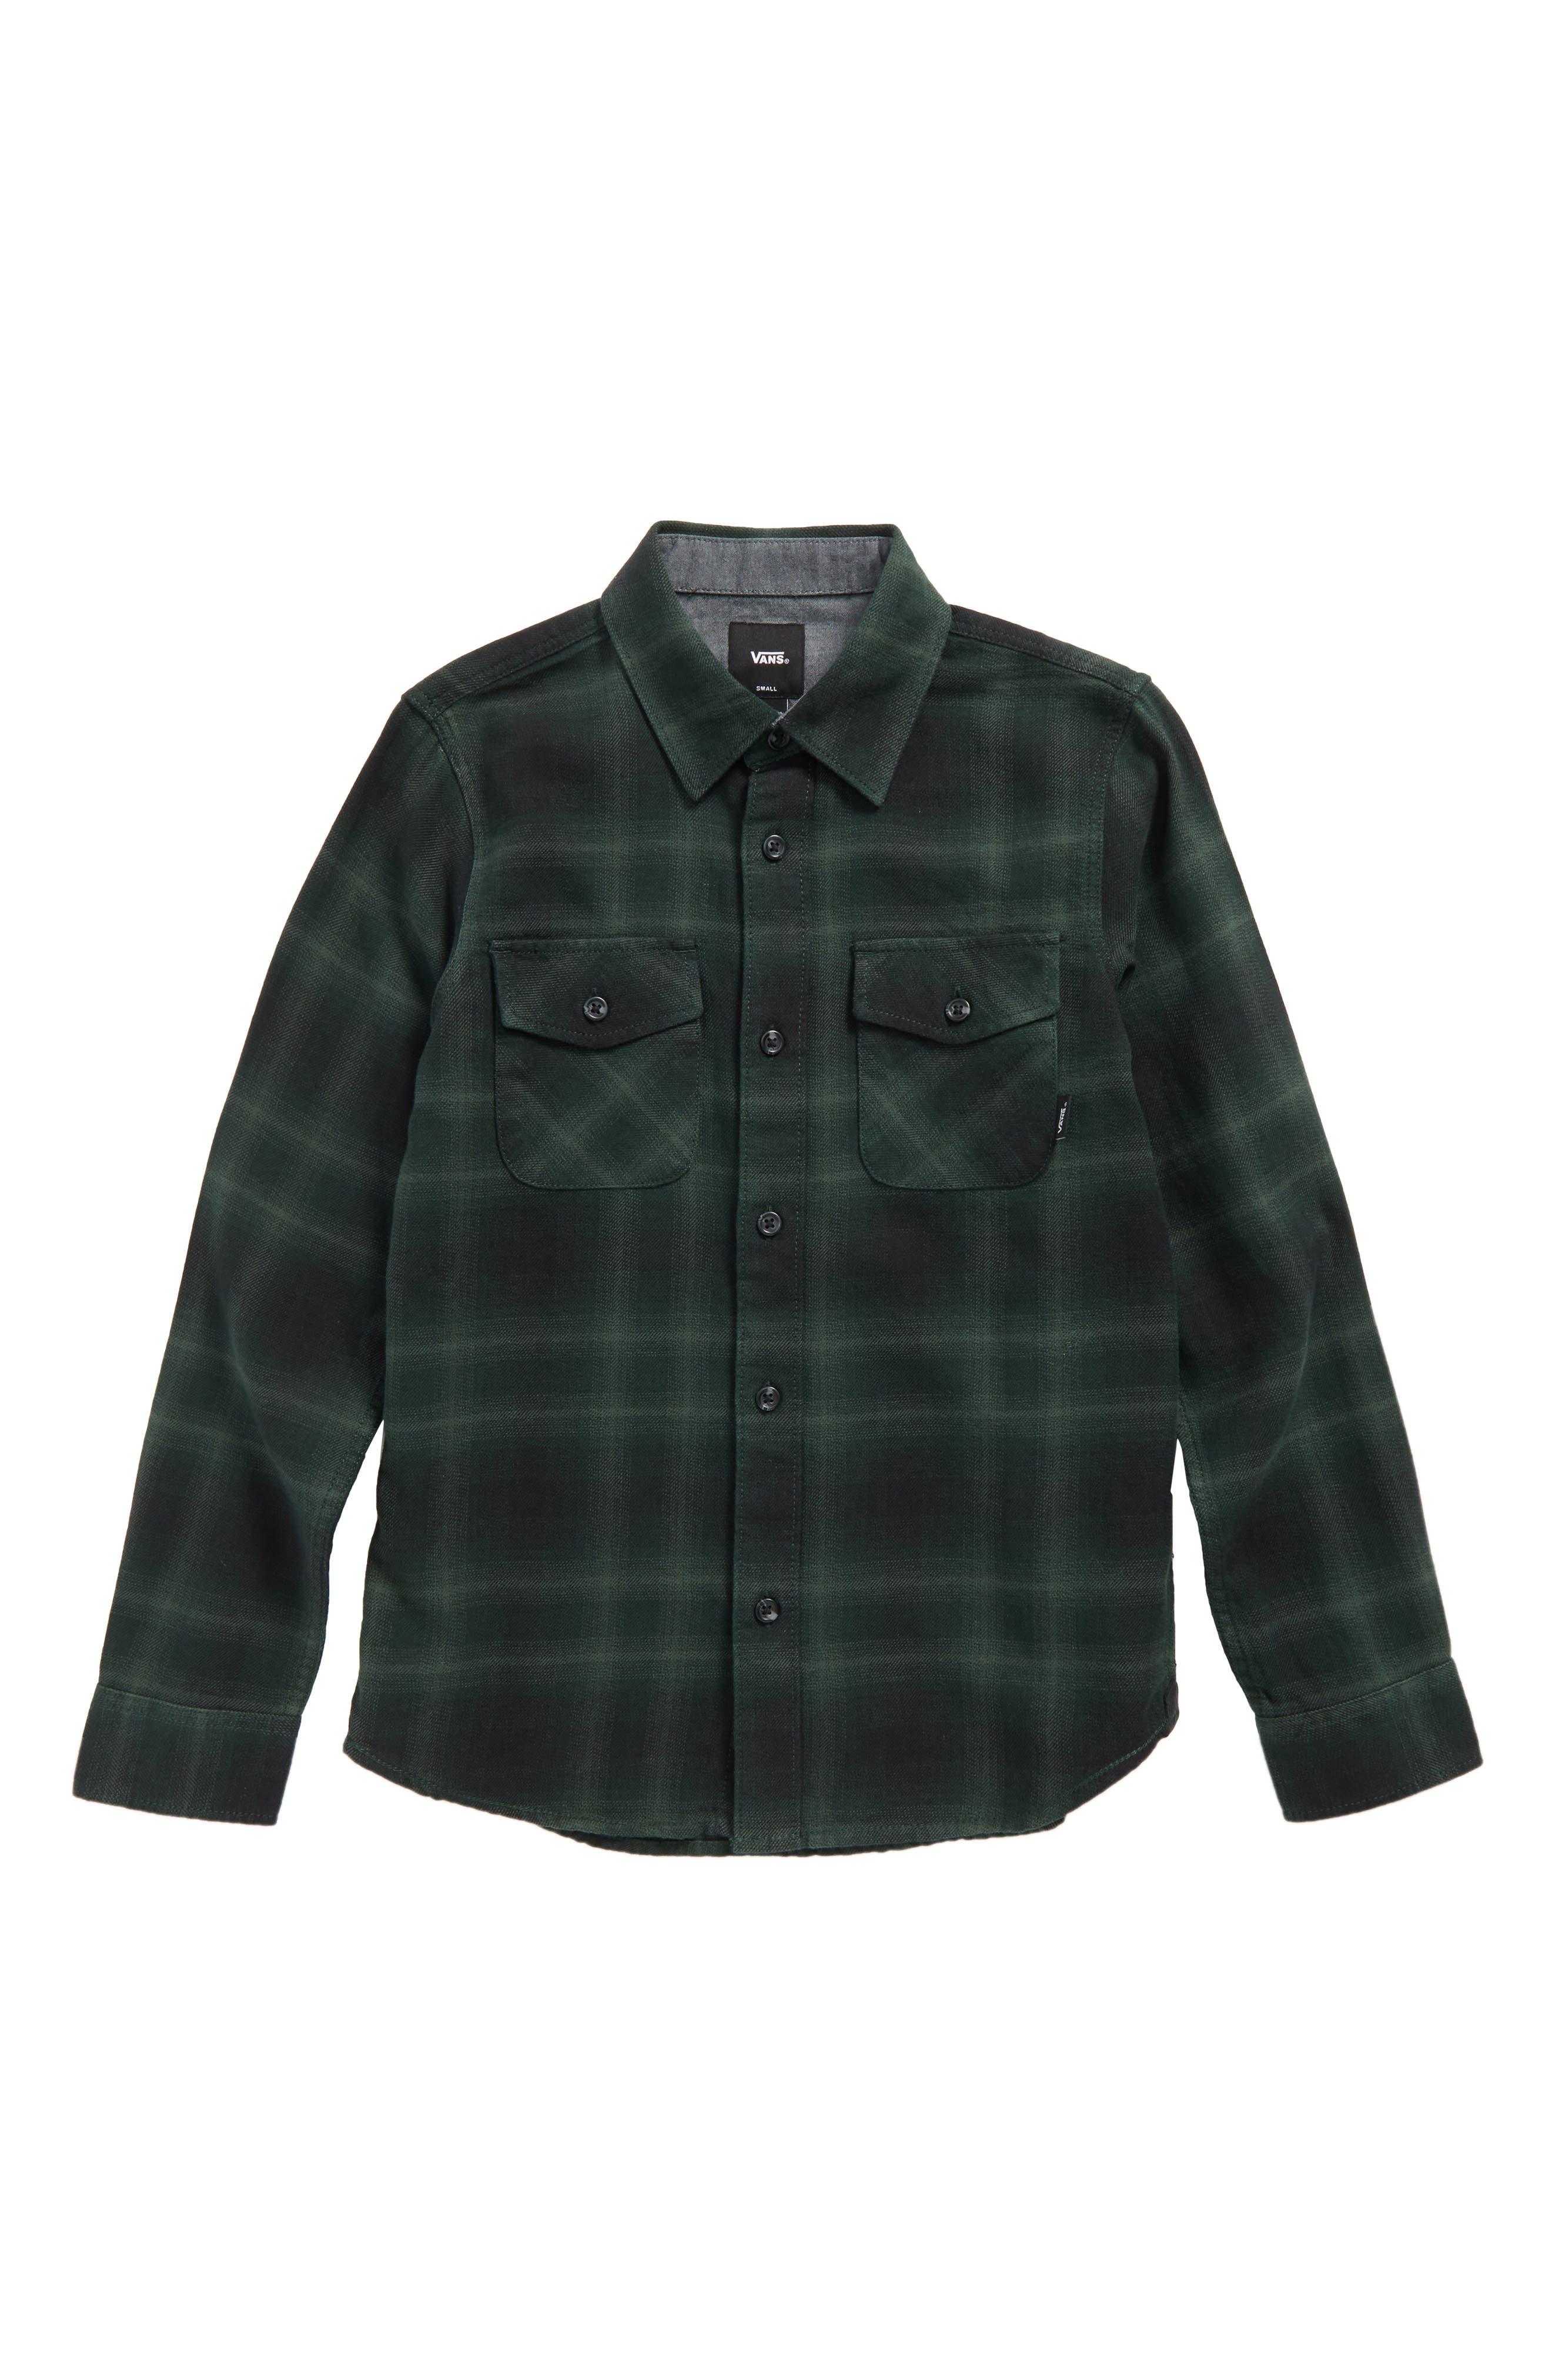 Alternate Image 1 Selected - Vans Monterey II Plaid Flannel Shirt (Big Boys)